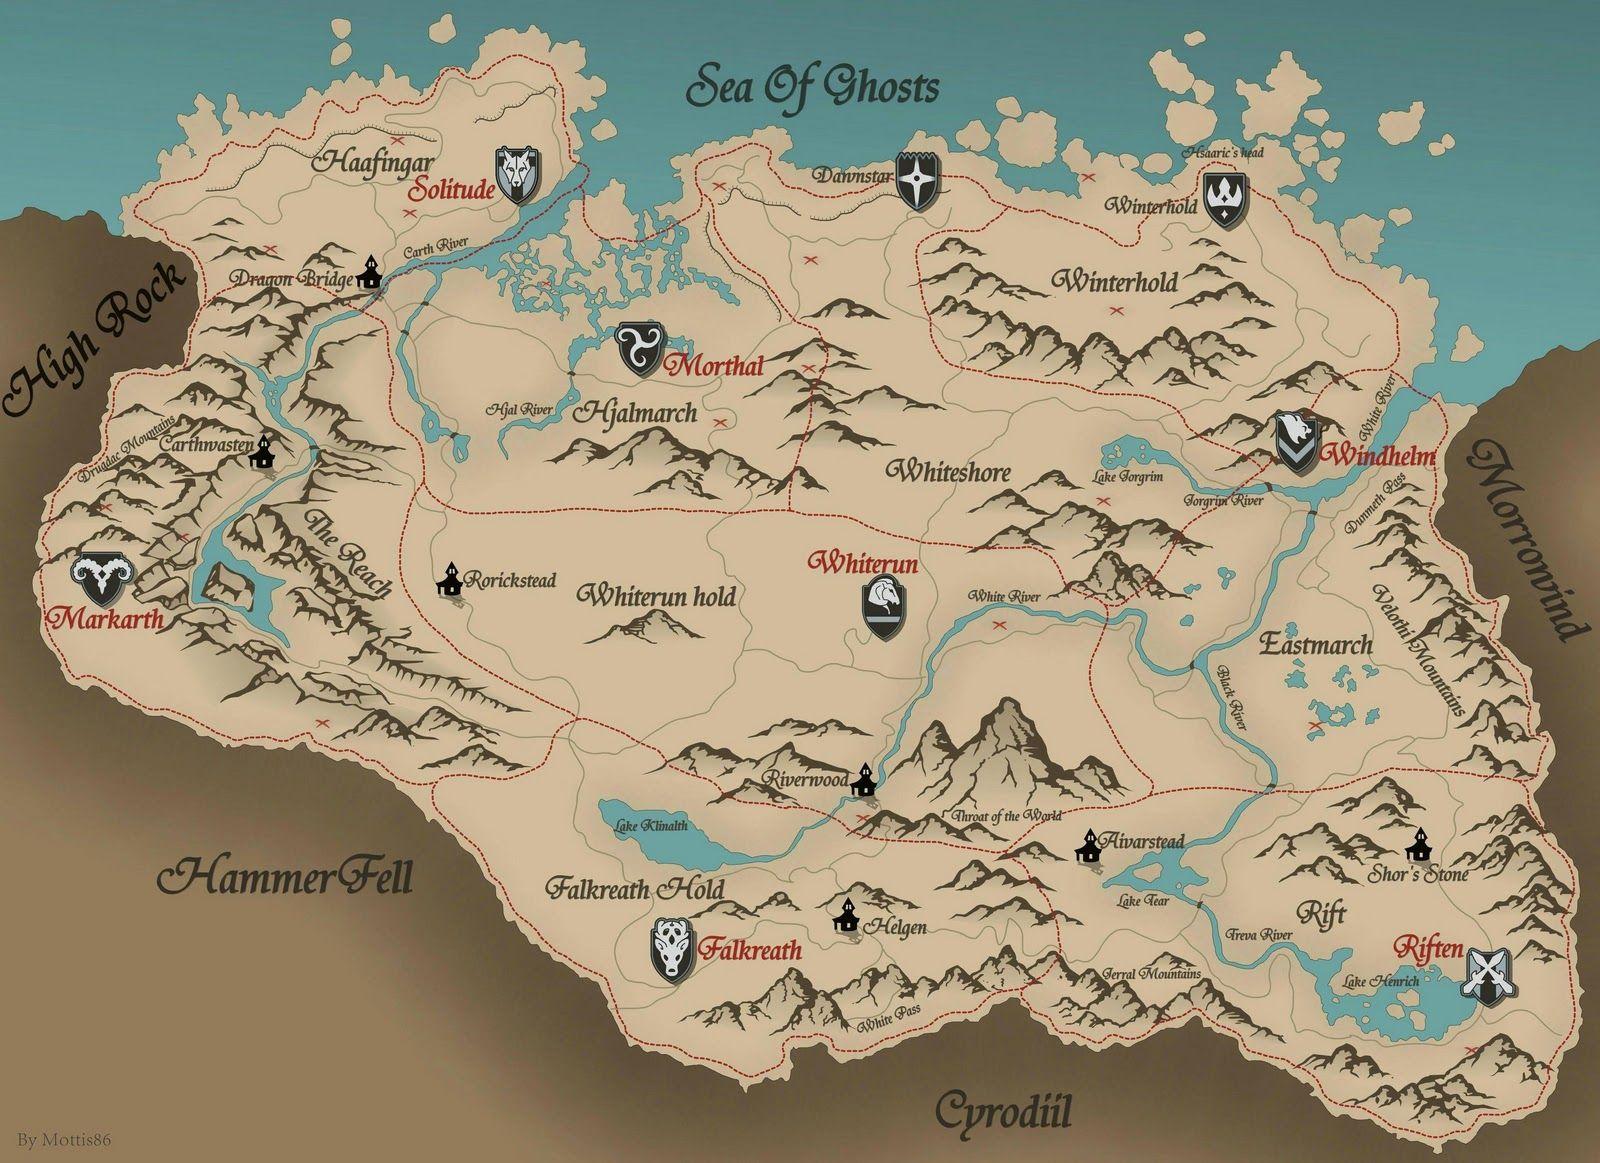 Skyrim! #skyrim #dawnguard #hearthfire | Skyrim | Skyrim map, Map